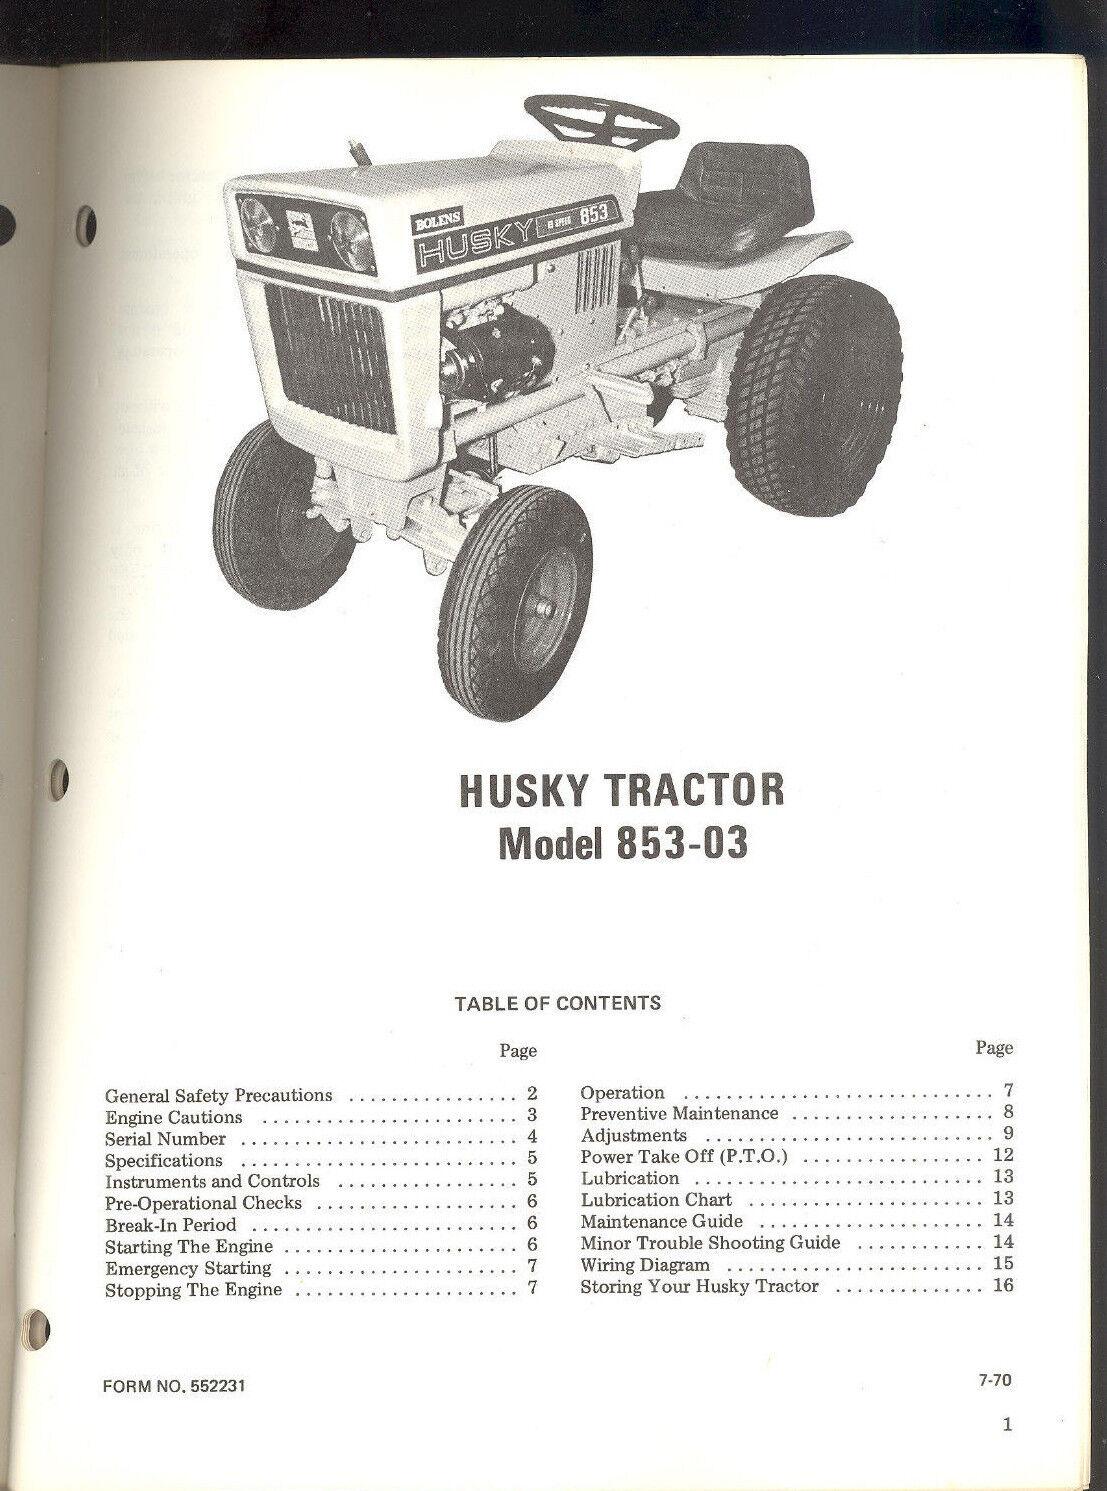 hight resolution of 1 of 3 1970 bolens husky tractor model 853 03 owners operators maintenance manual